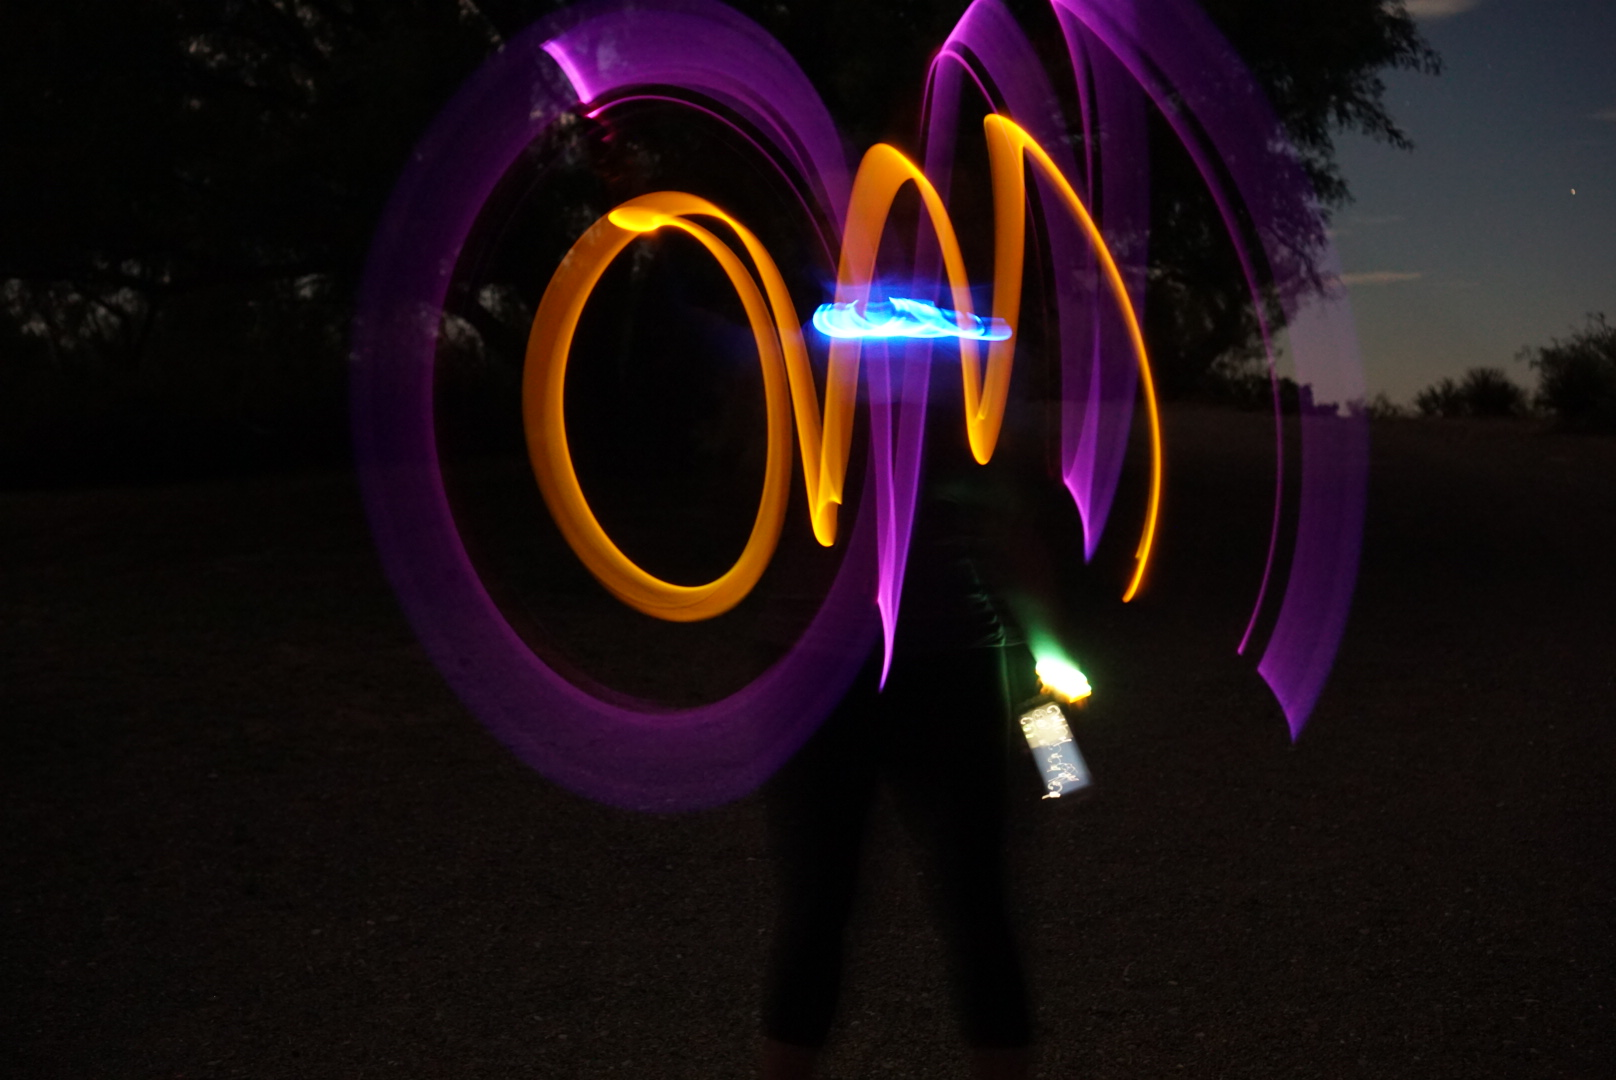 glow-stick-photos-alternative-sparkler-pictures-4